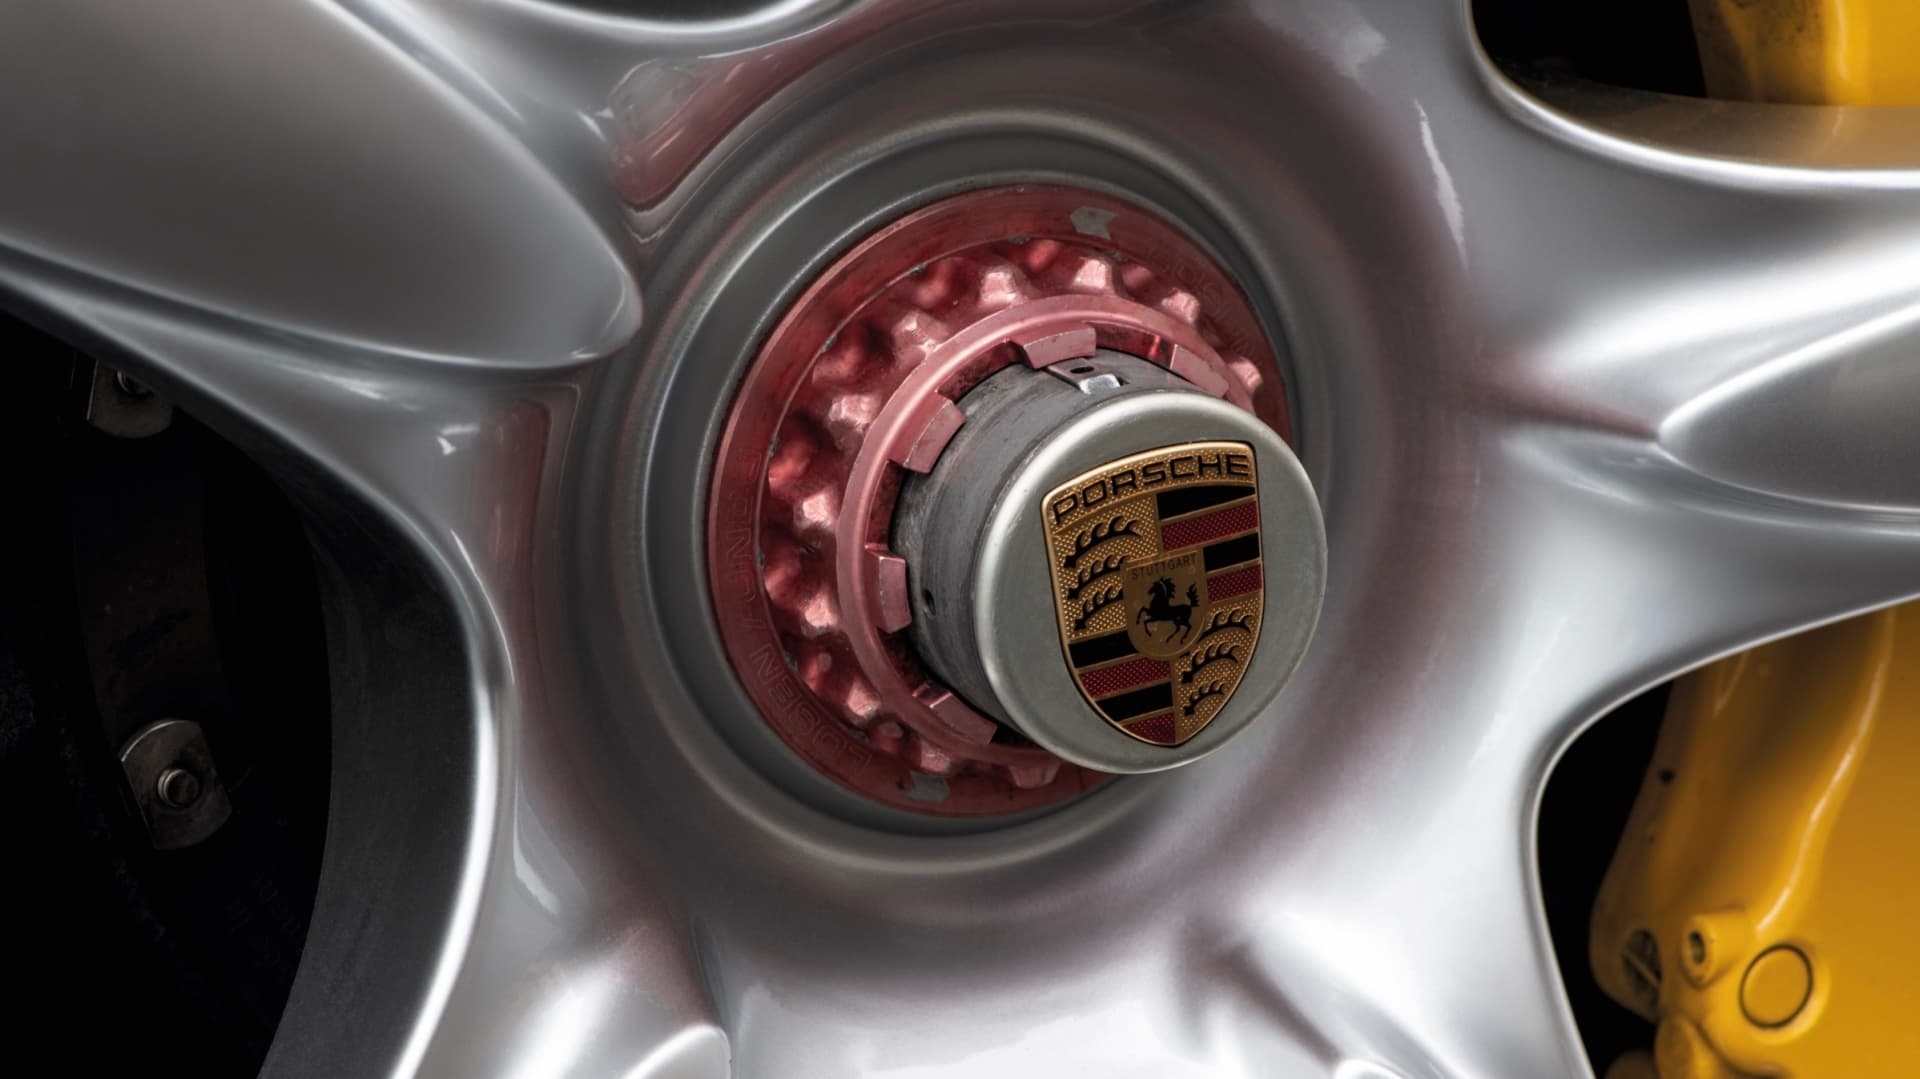 Porsche Carrera Gt 20 Anos 08